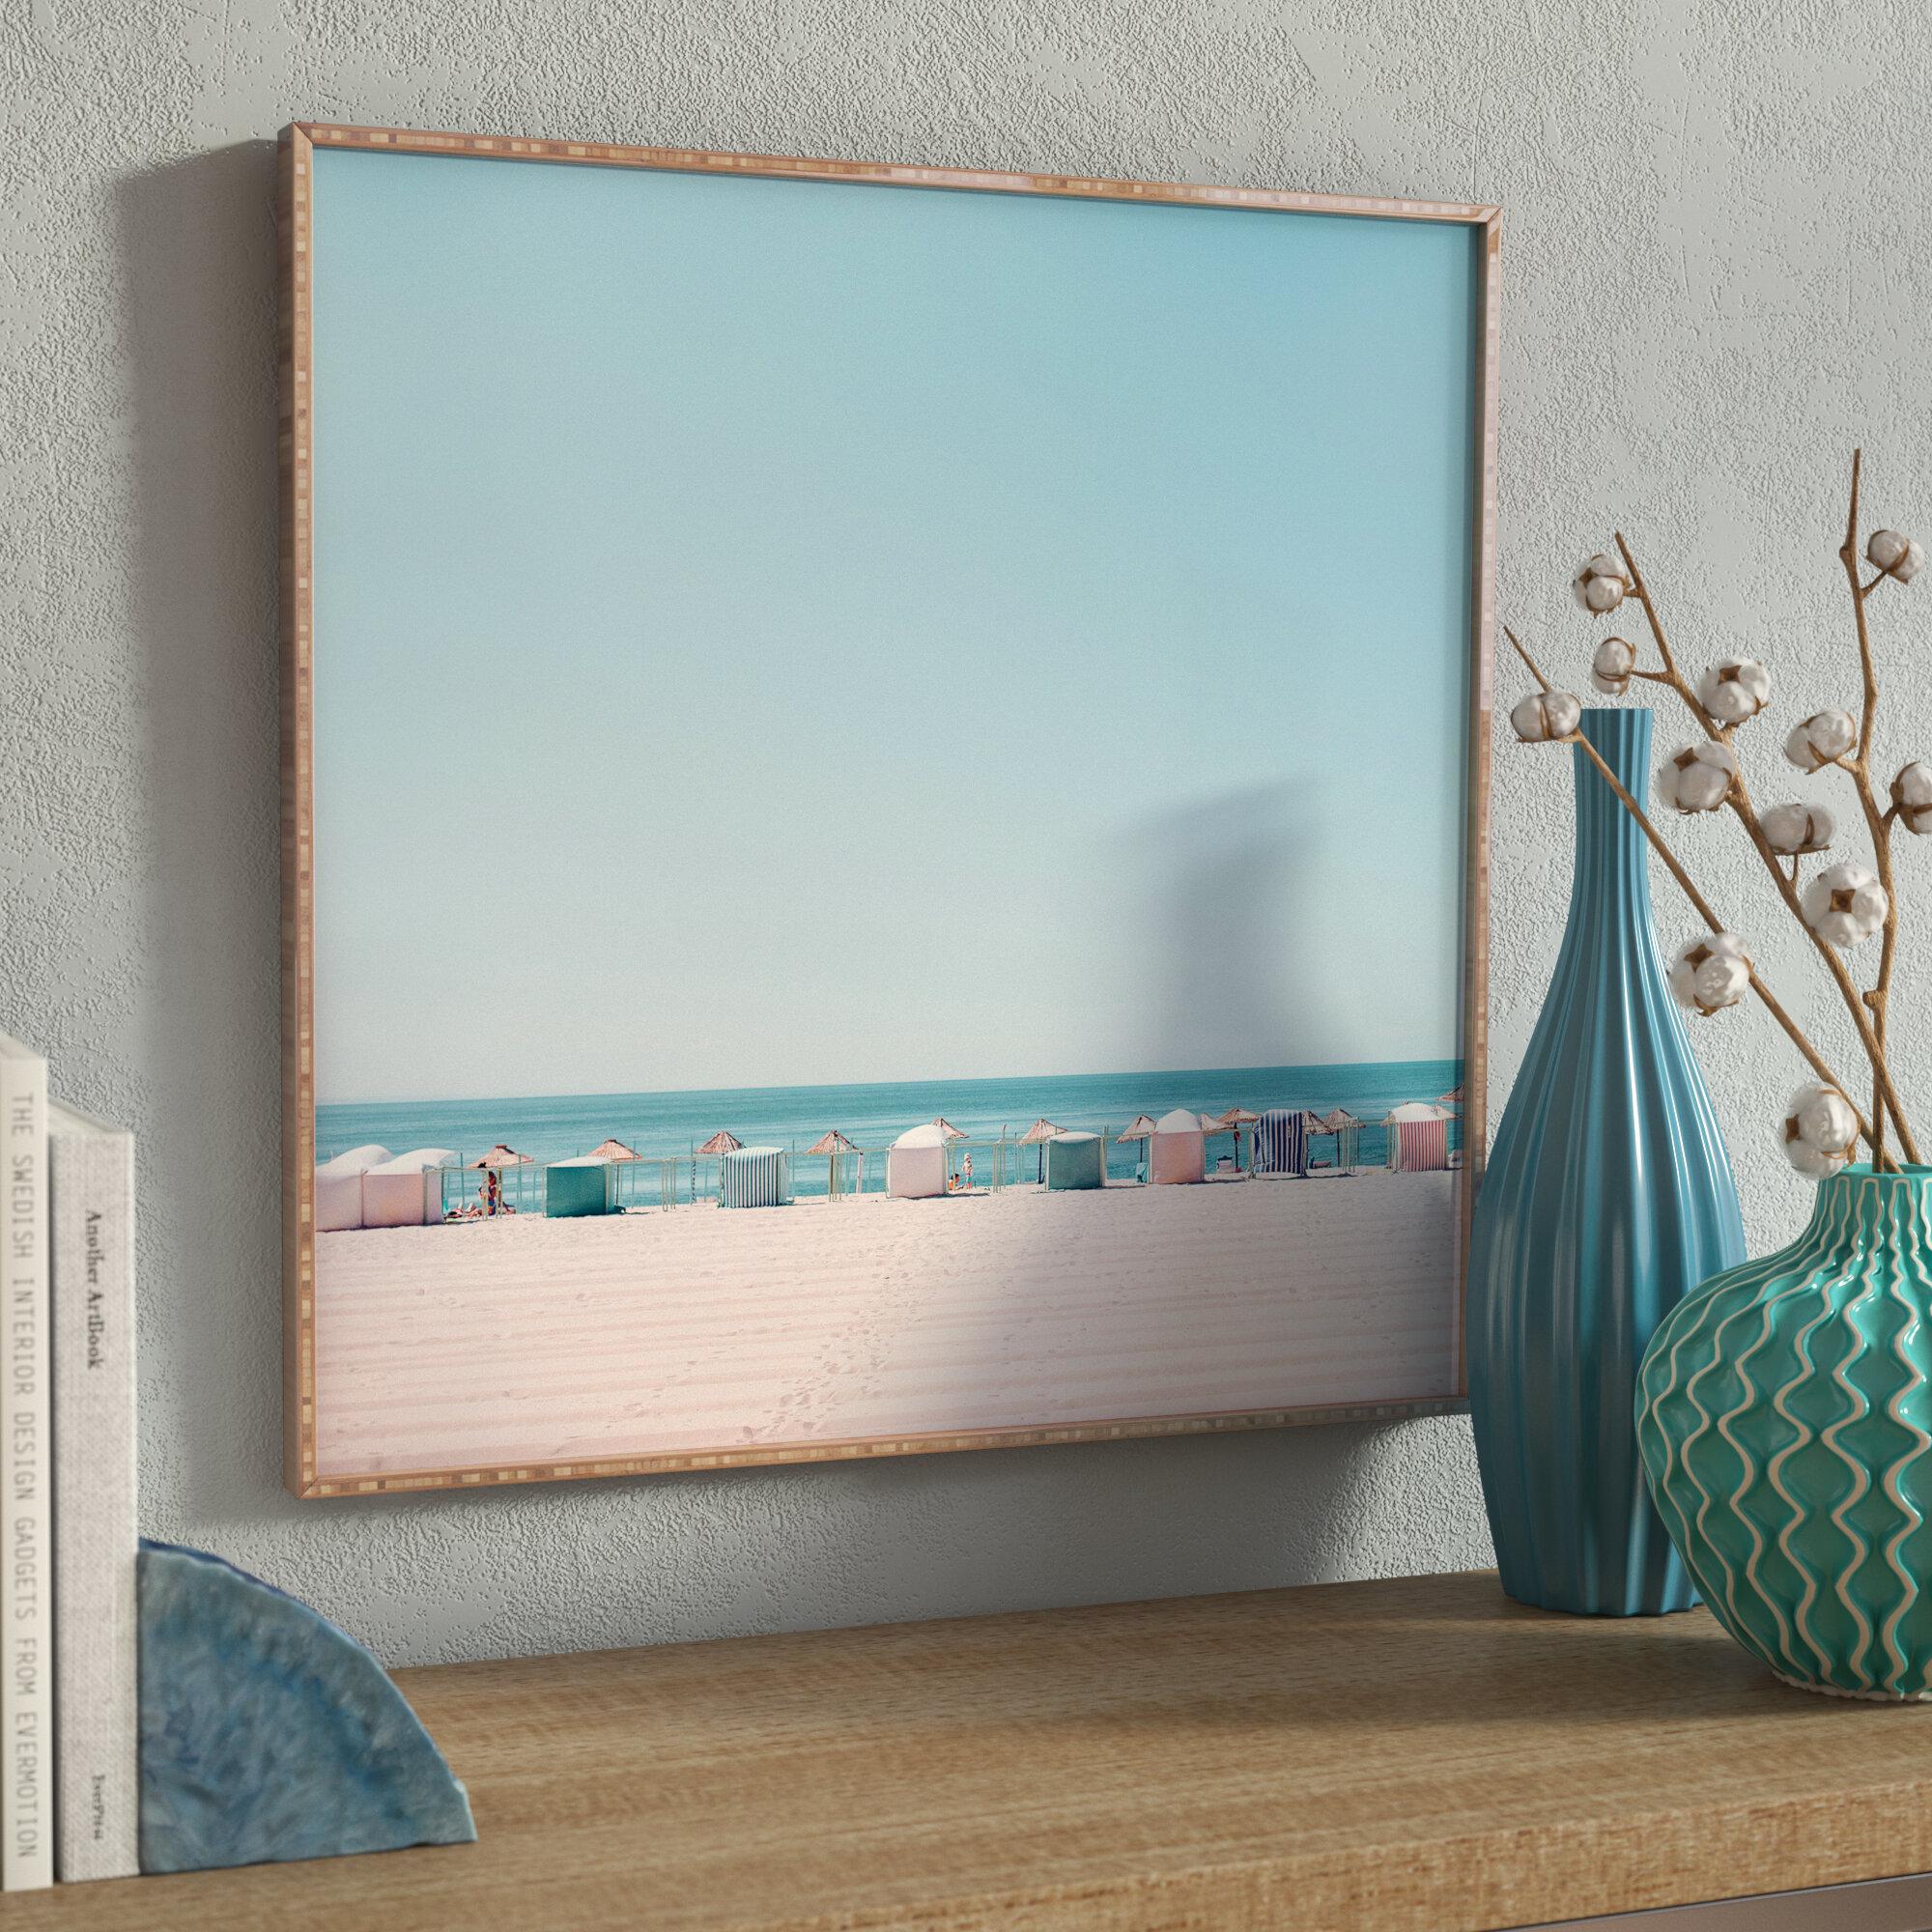 Beach Ocean Framed Wall Art You Ll Love In 2021 Wayfair